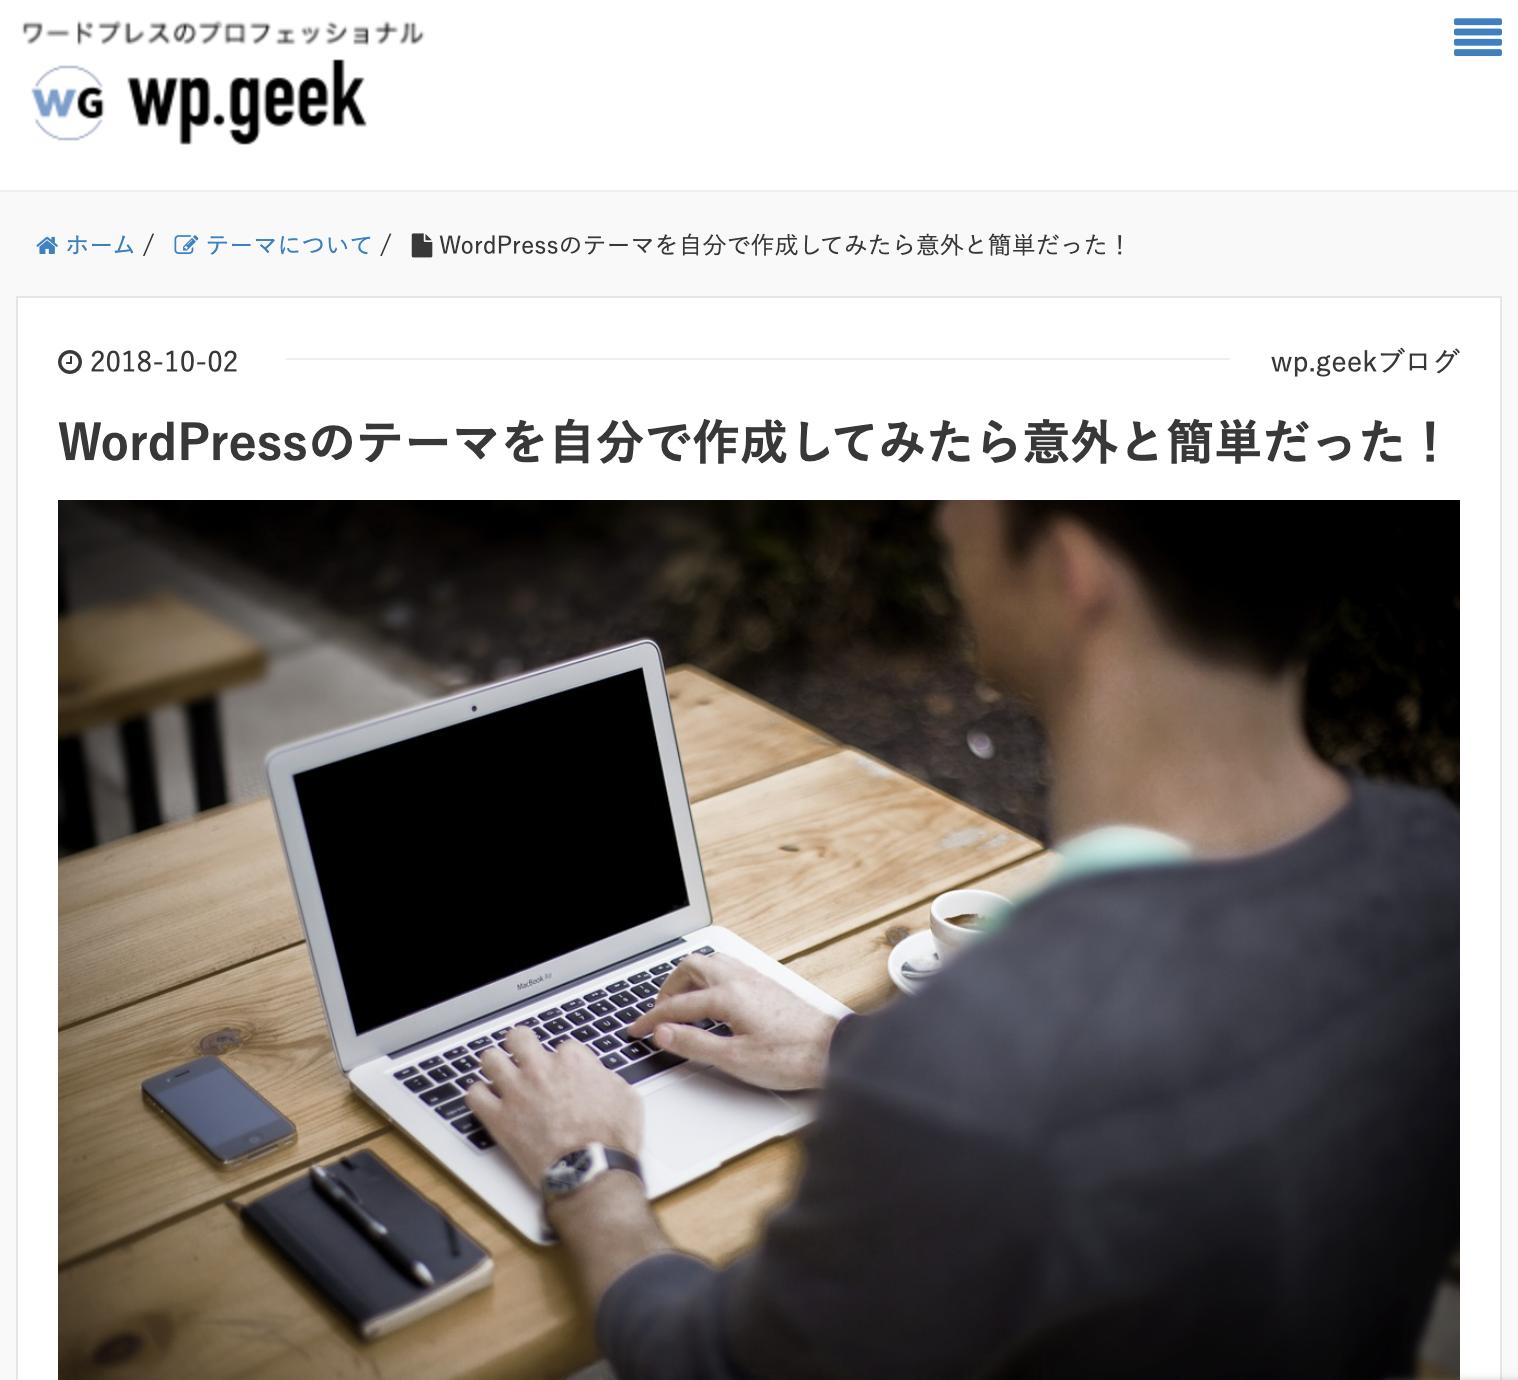 wp.geekブログ